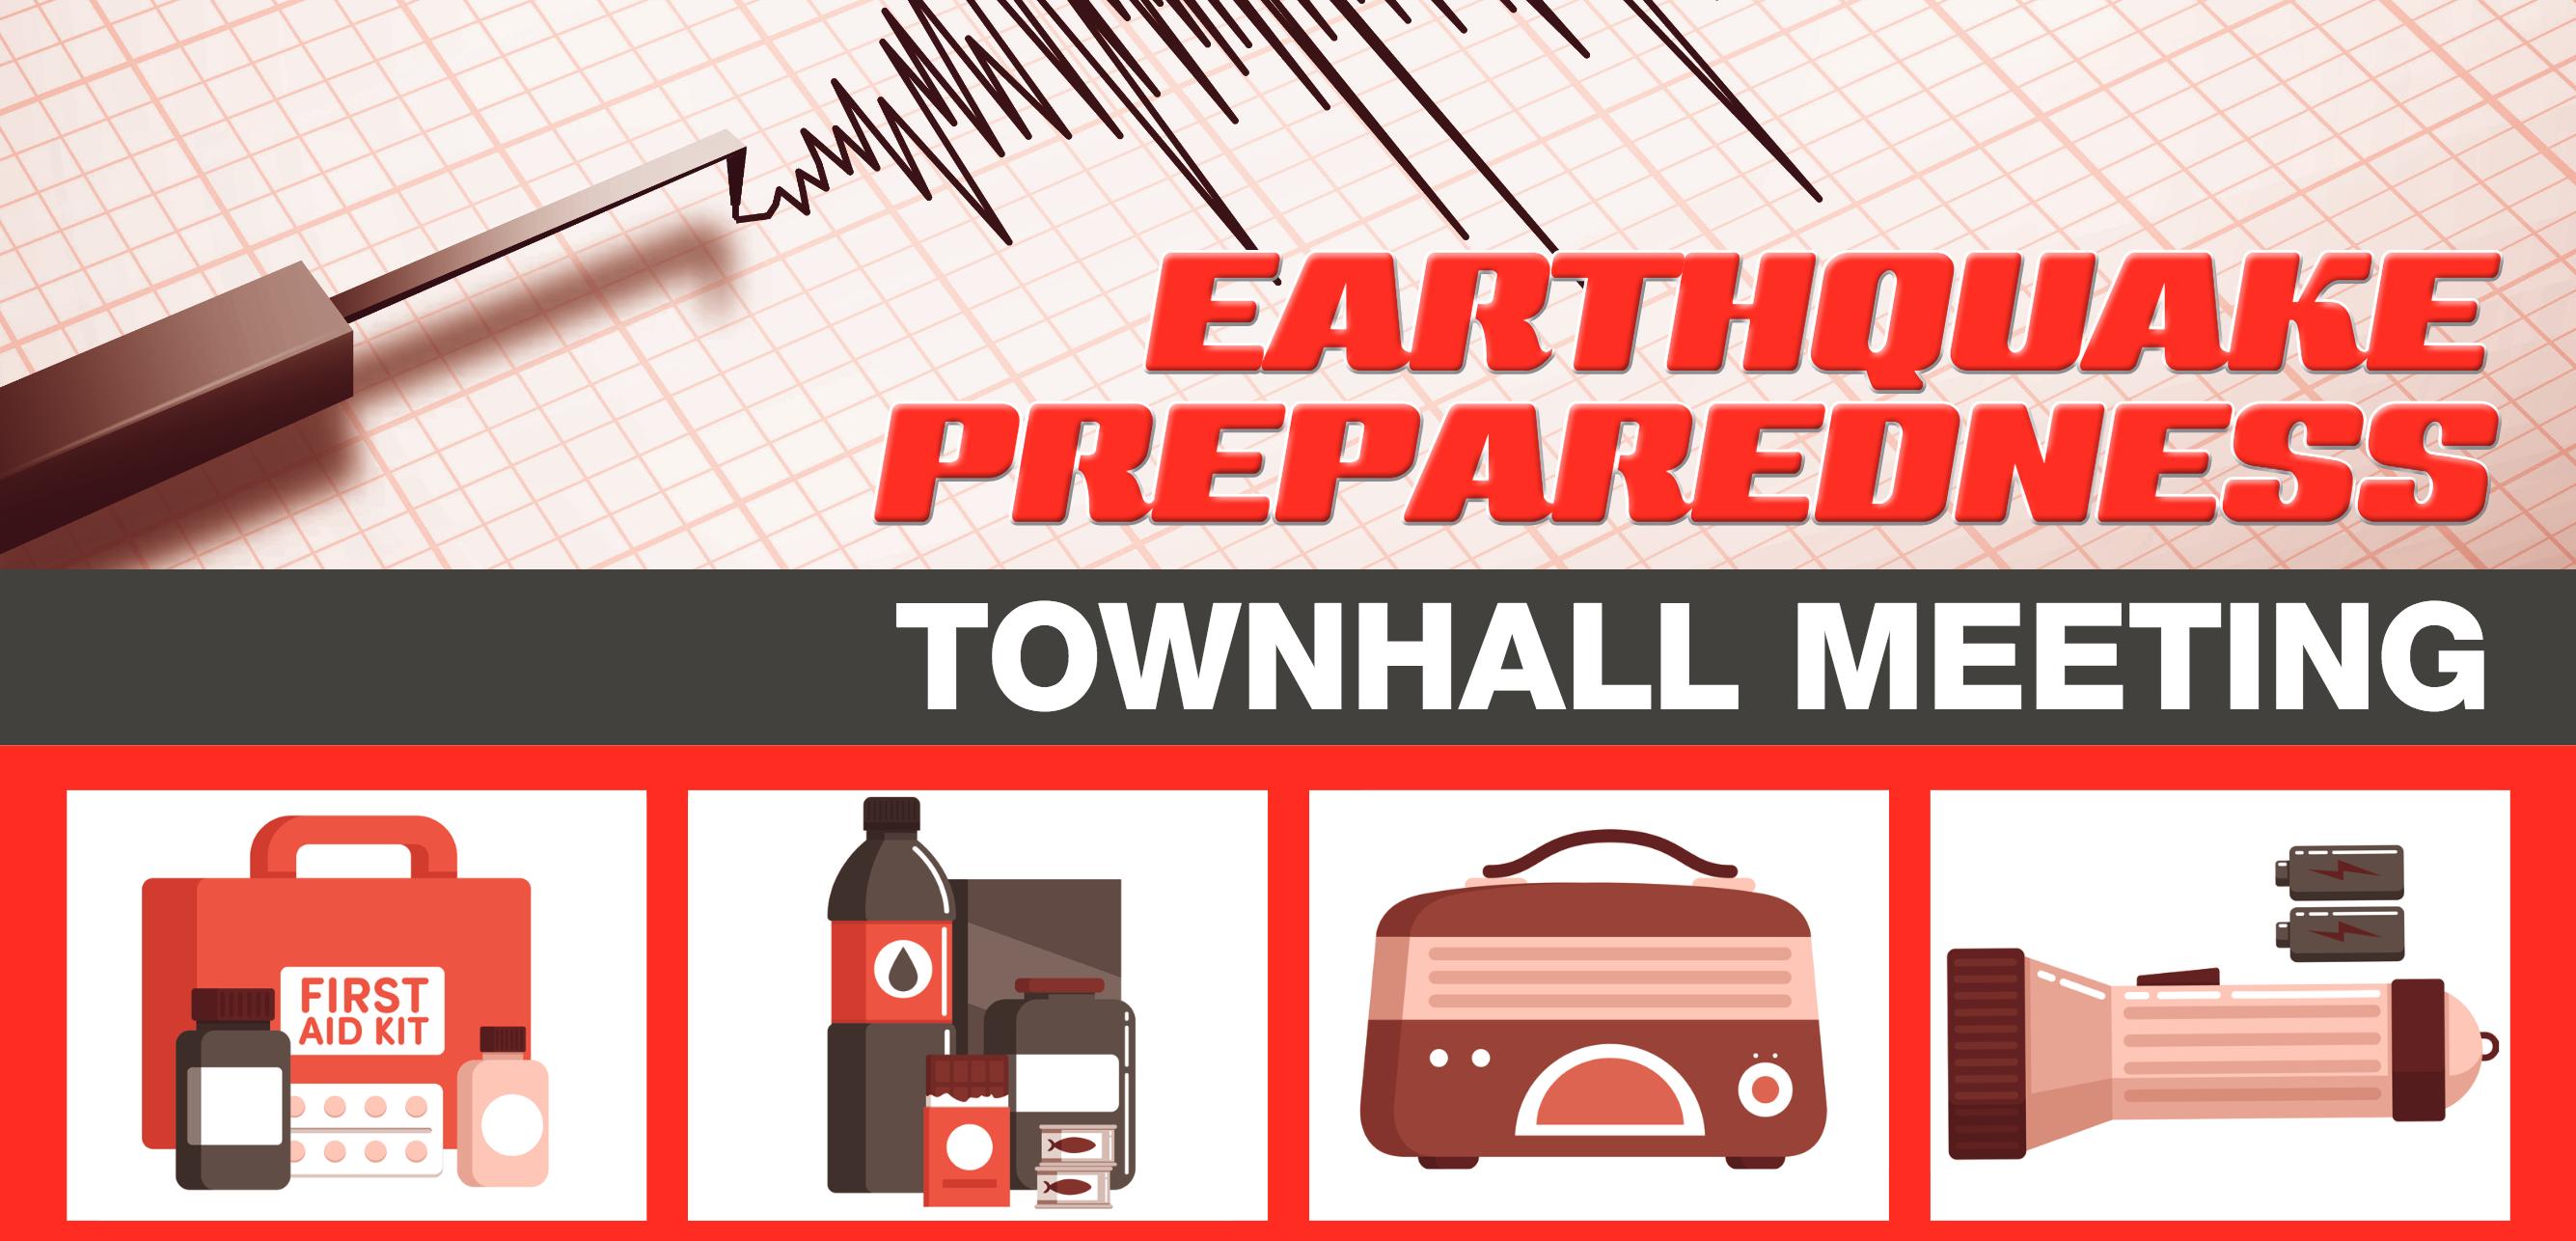 Earthquake clipart earthquake preparedness, Earthquake.